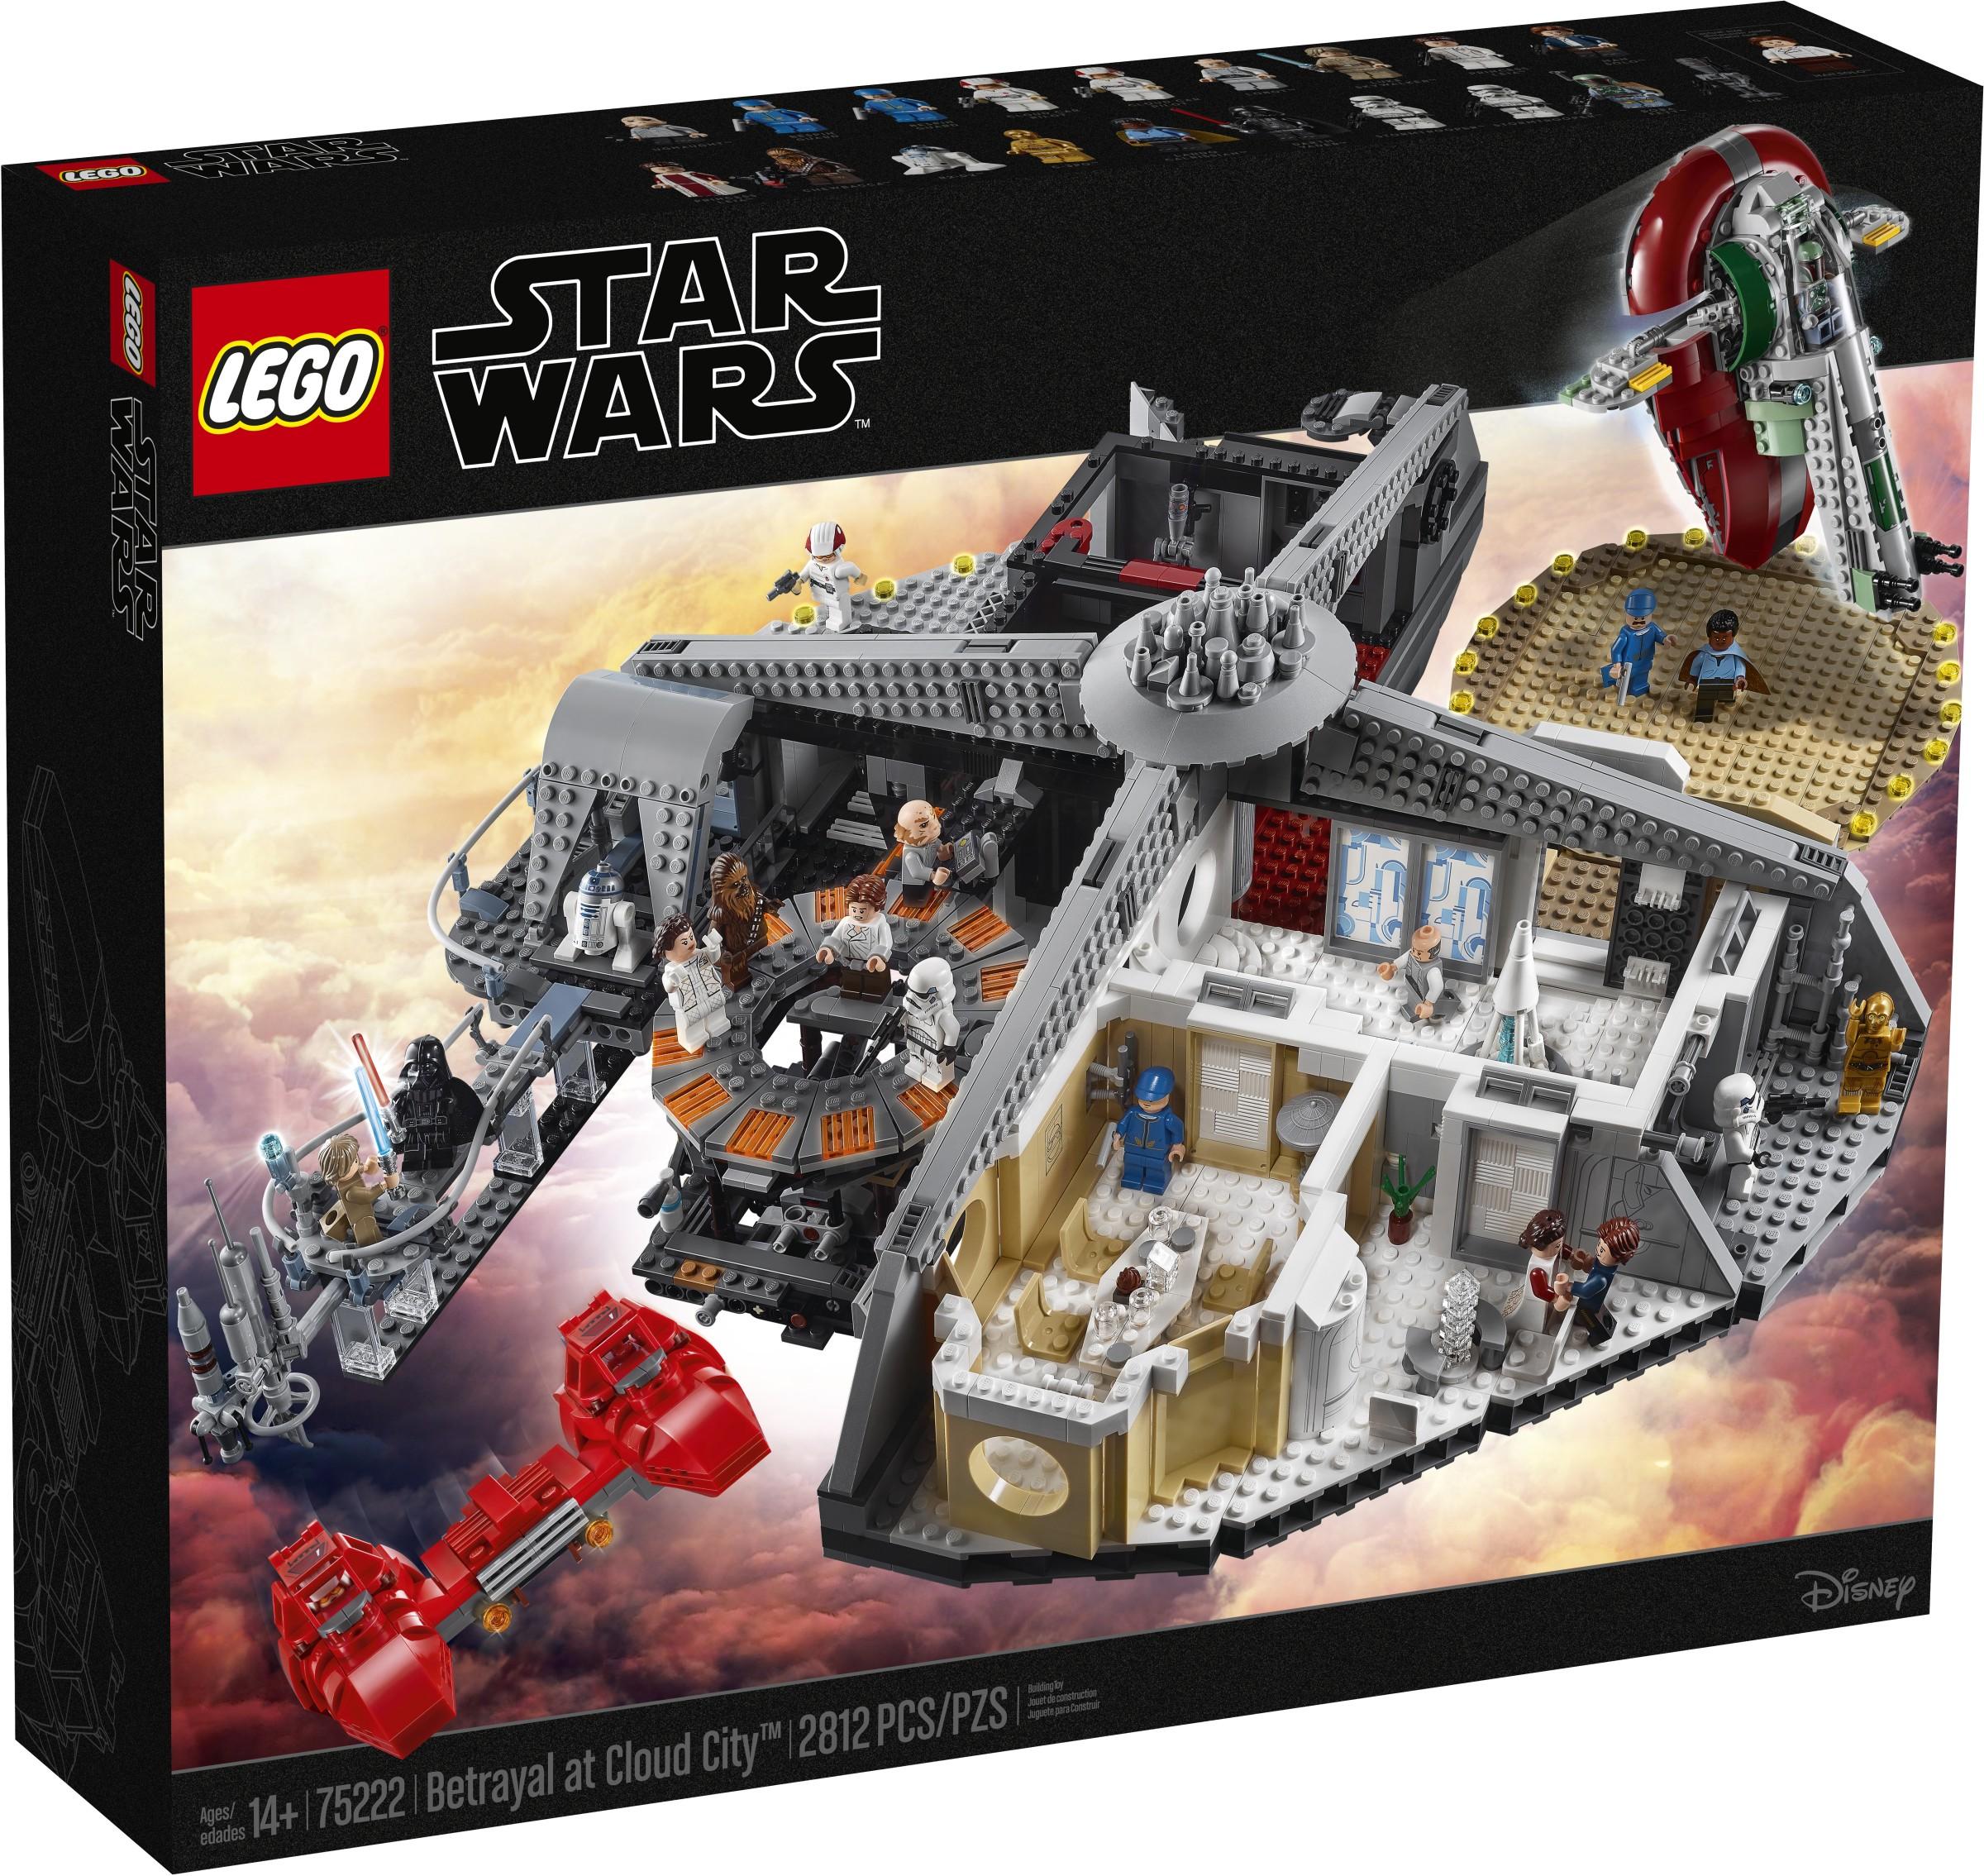 LEGO STAR WARS LUKE SKYWALKER MINIFIGURE Betrayal at Cloud City 75222 NEW